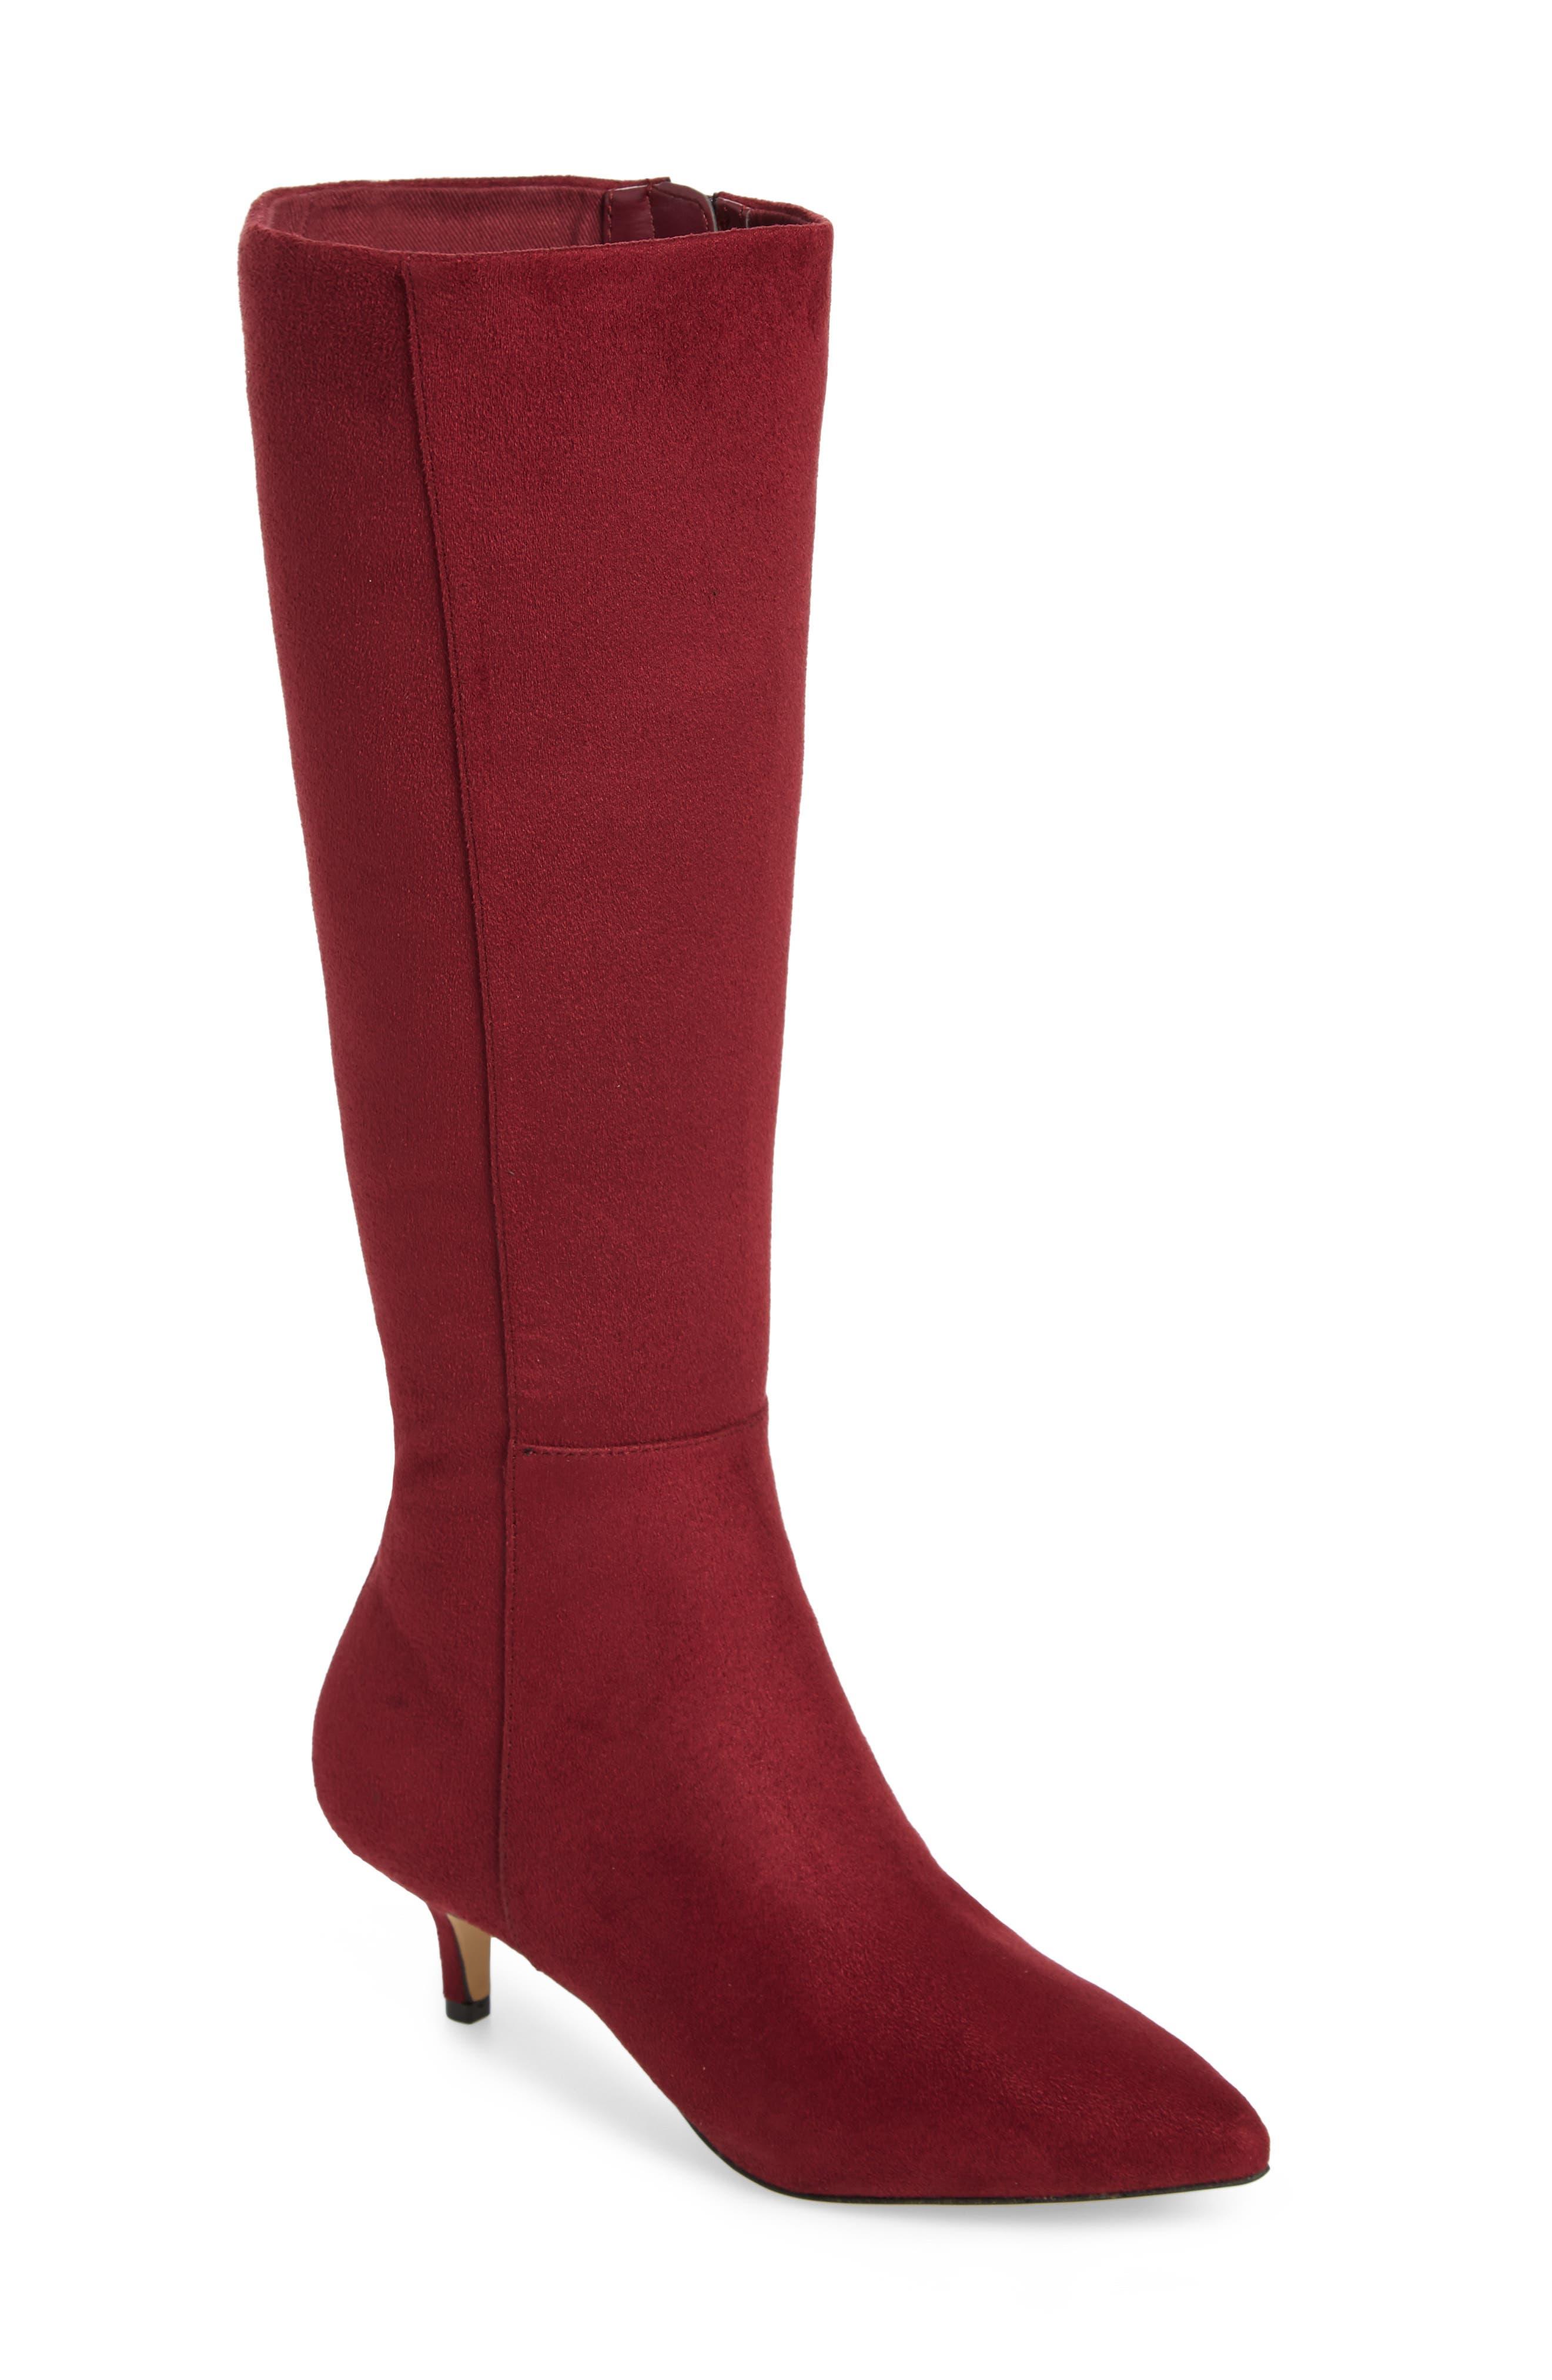 Athena Alexander Lyon Knee High Boot, Burgundy